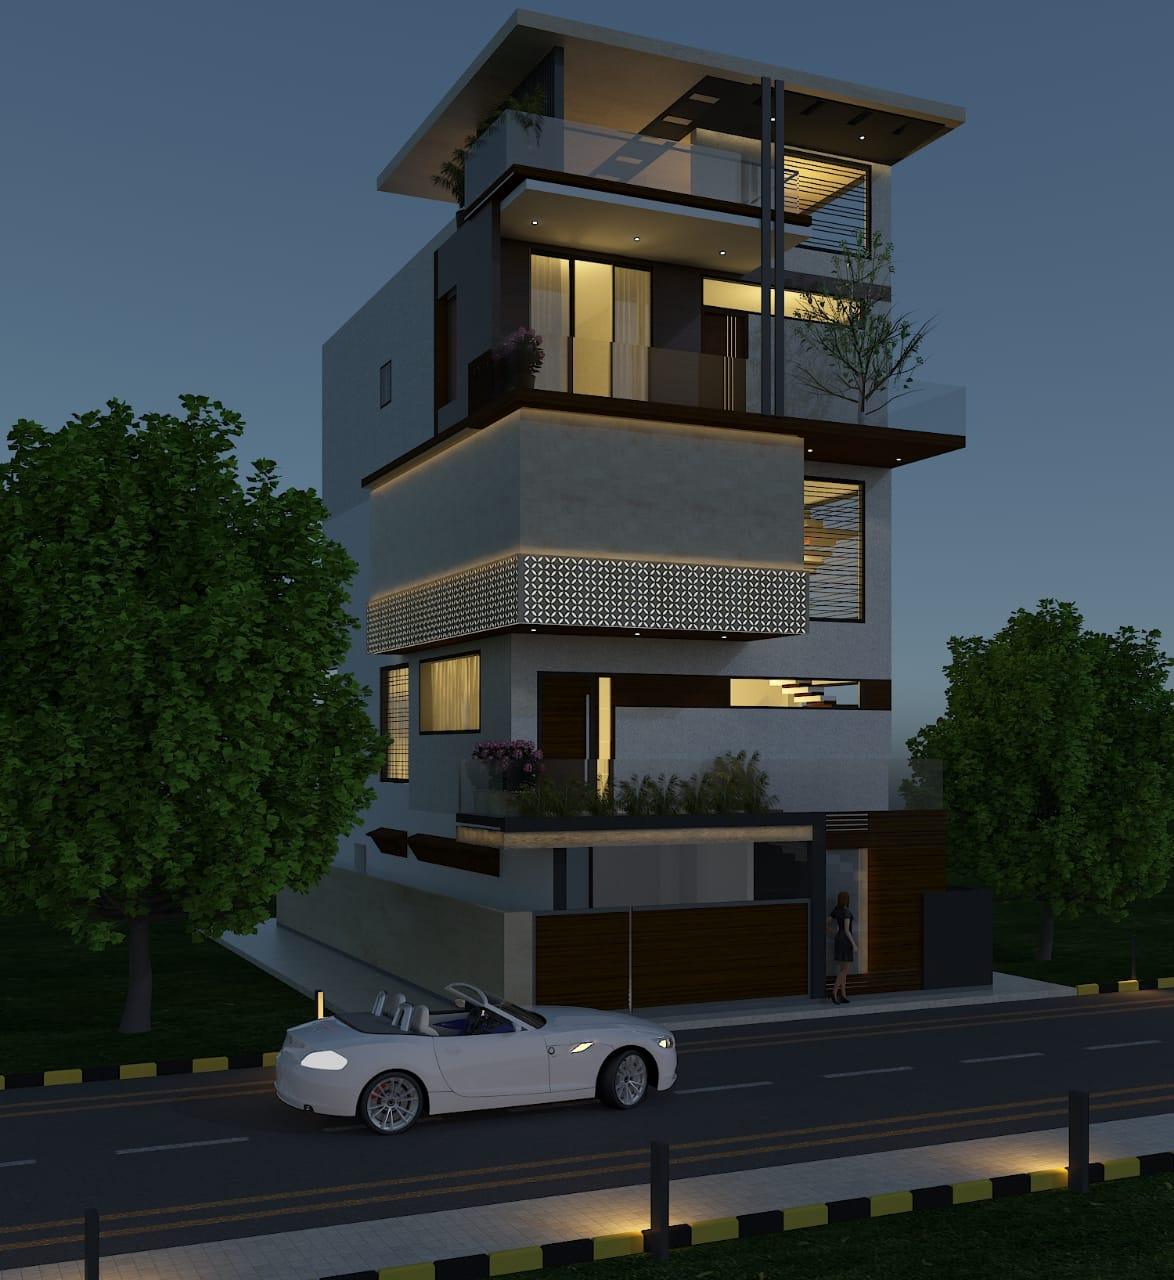 Kaladikam Studio in Jaya Nagar 9th Block, Bangalore-560078